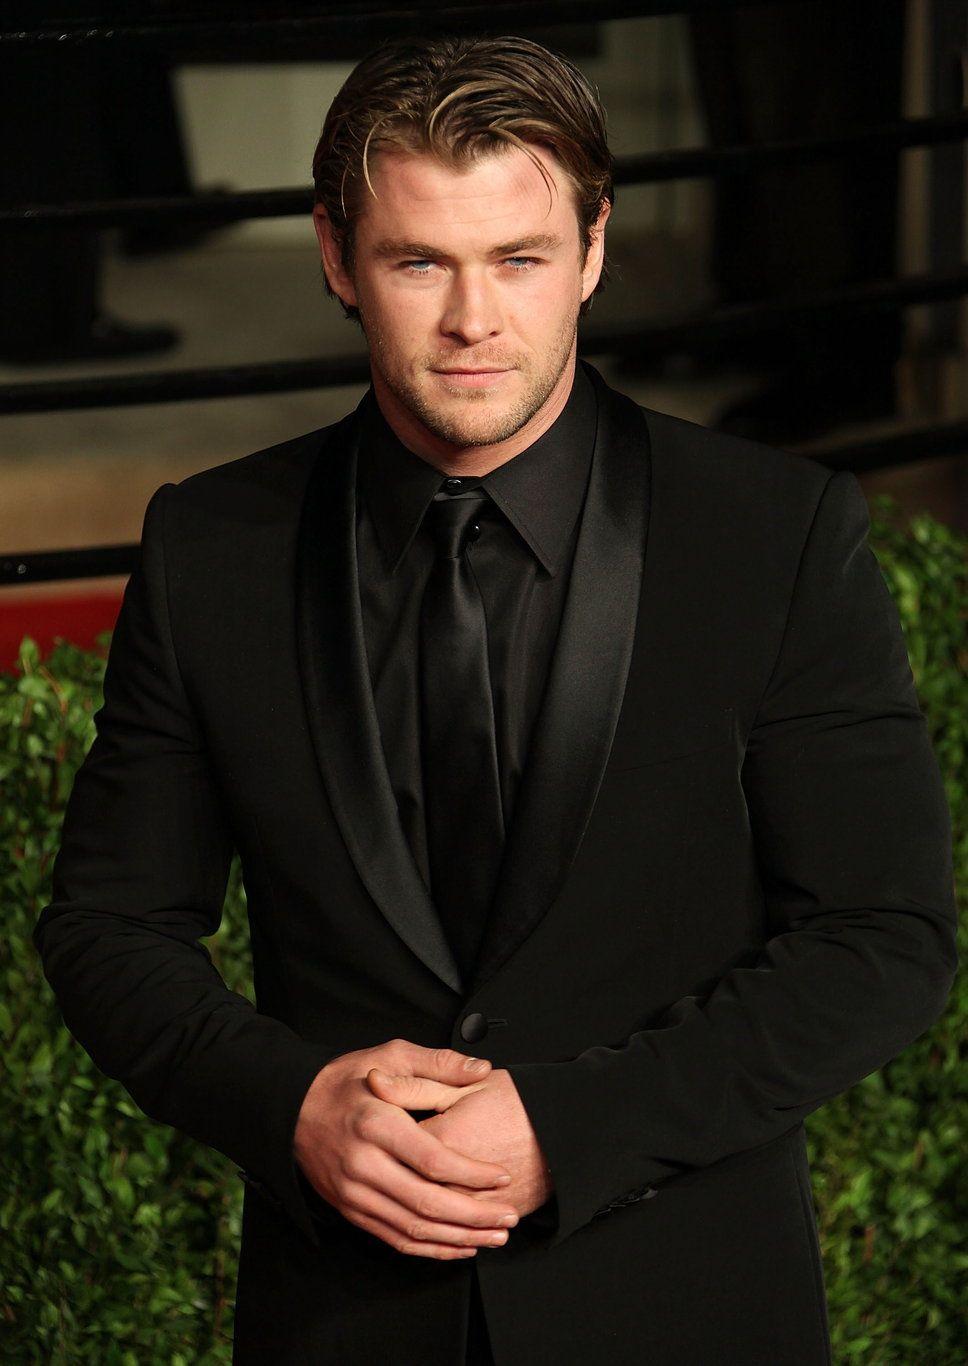 Chris Hemsworth Tumblr Black Suit Black Shirt All Black Suit All Black Tuxedo